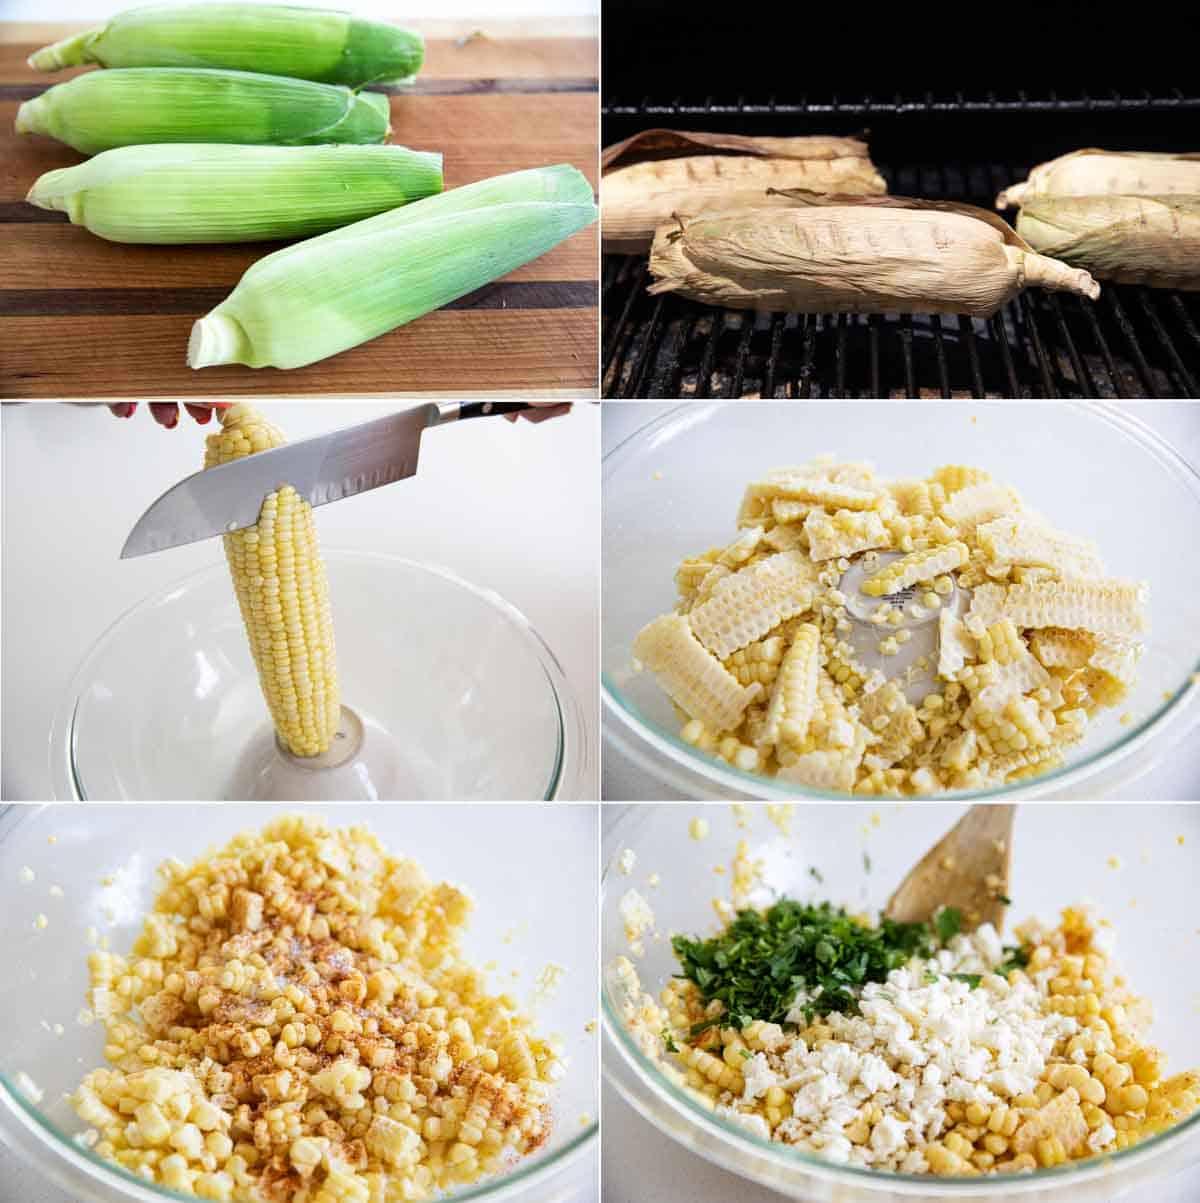 steps to make Mexican corn salad